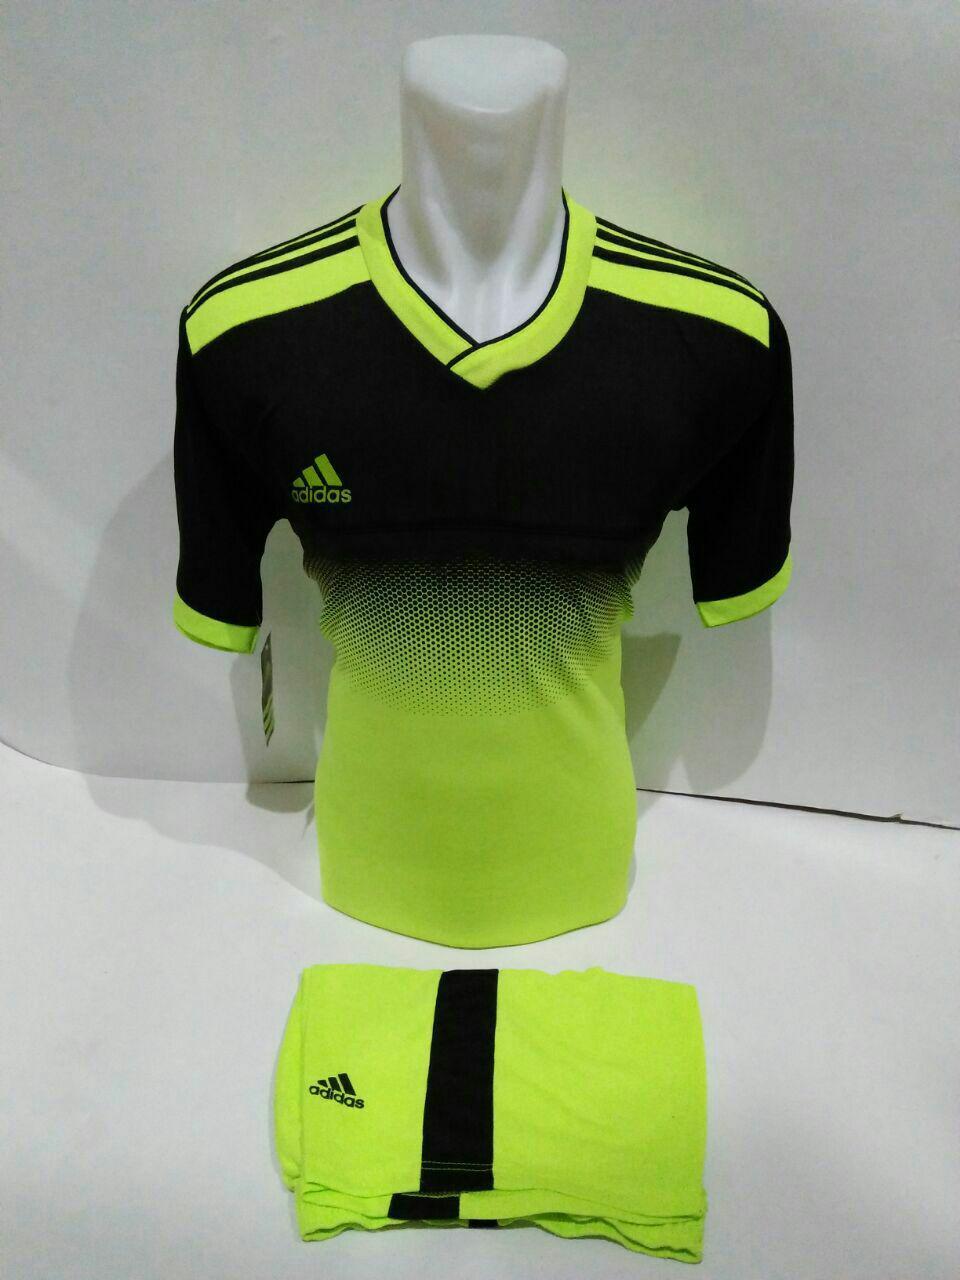 Baju Kaos Jersey Olahraga Setelan Bola Futsal Volly AD 04 Stabilo